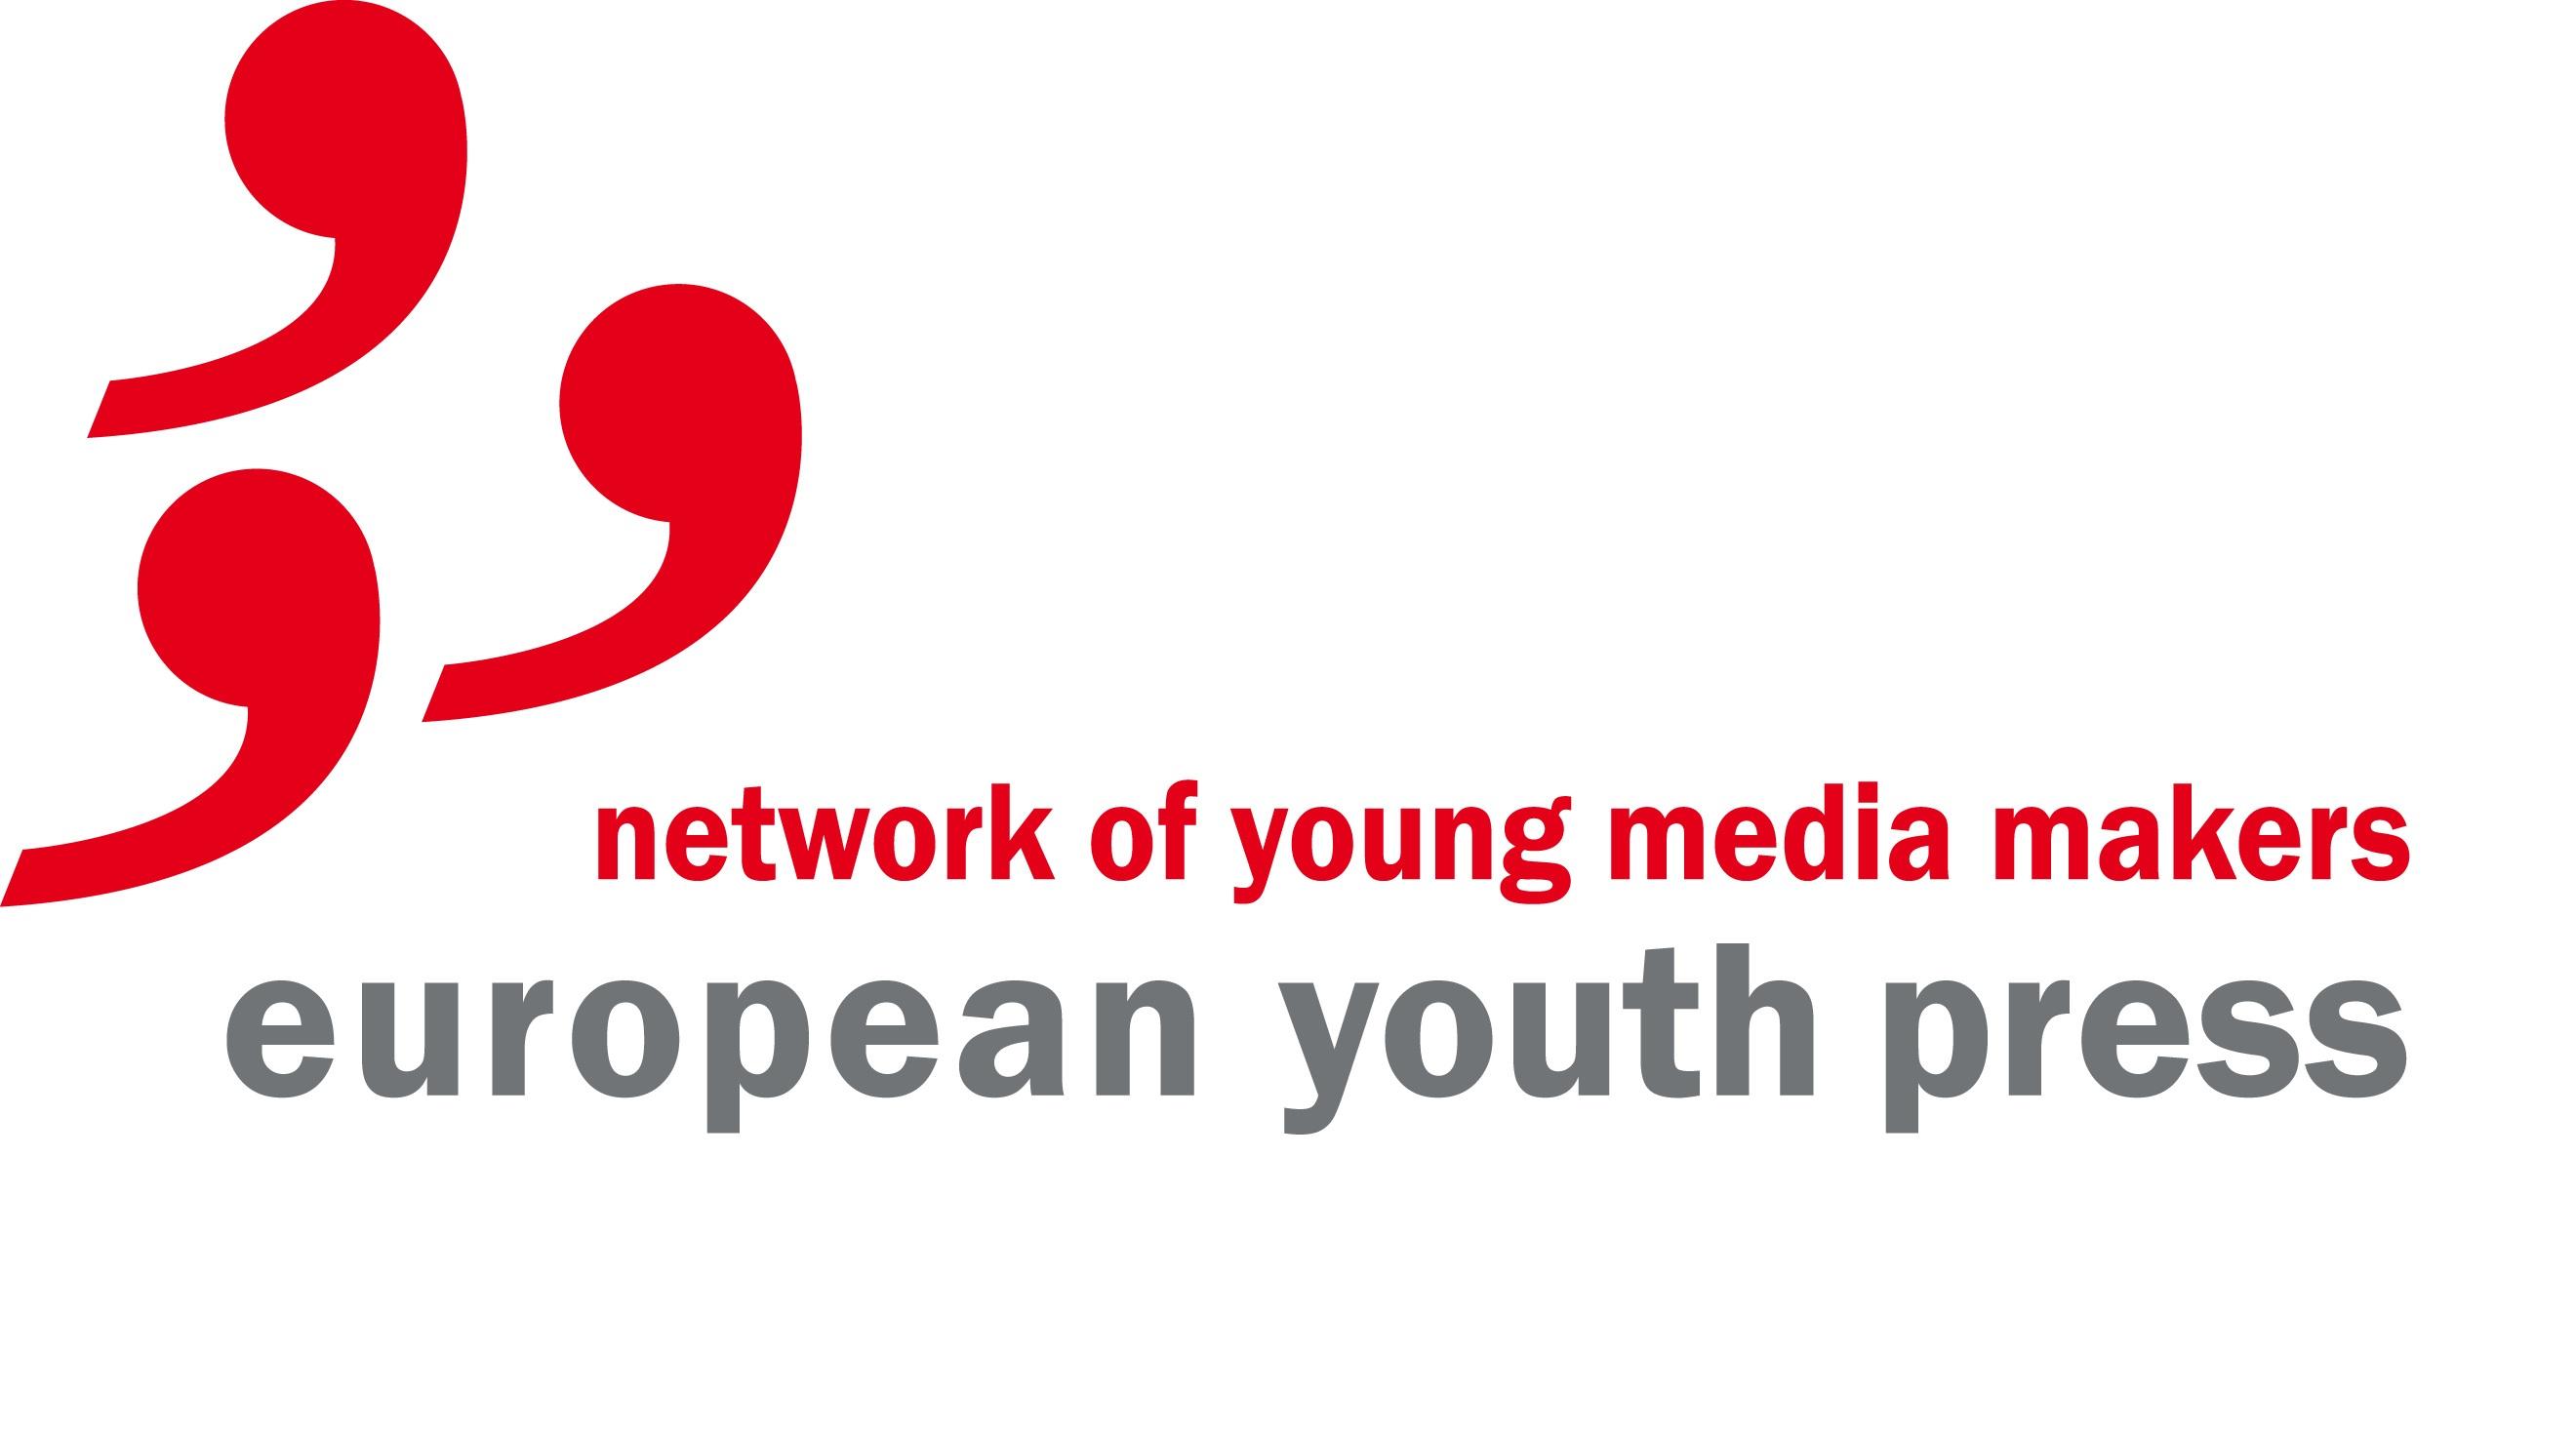 European Youth Press seeks New Board Members for 2014/2016-mandate period